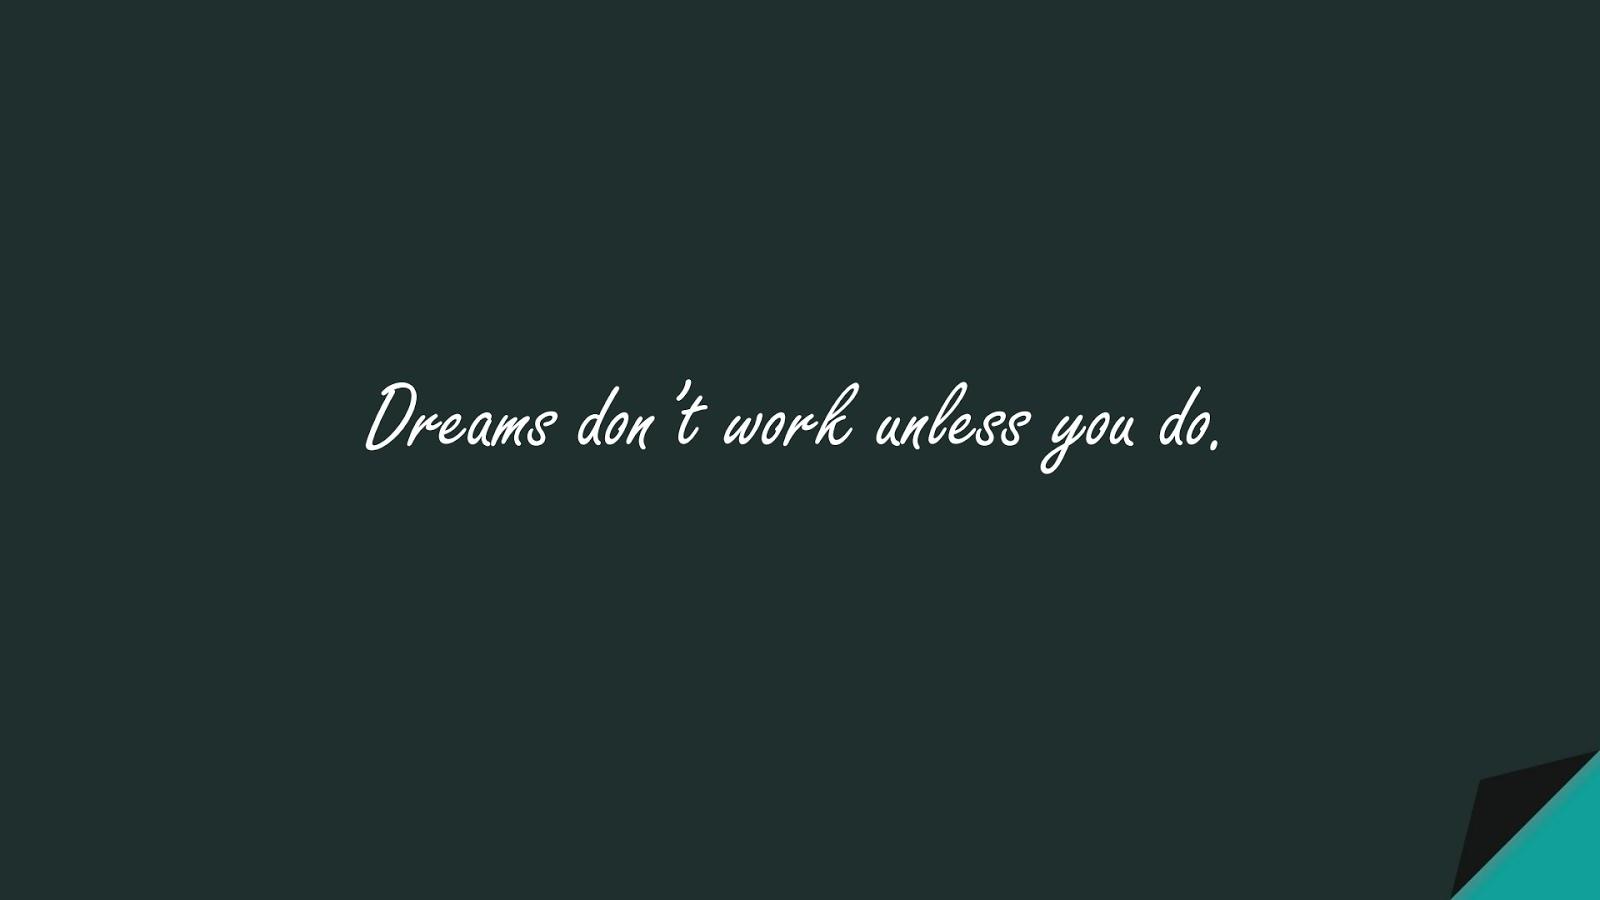 Dreams don't work unless you do.FALSE